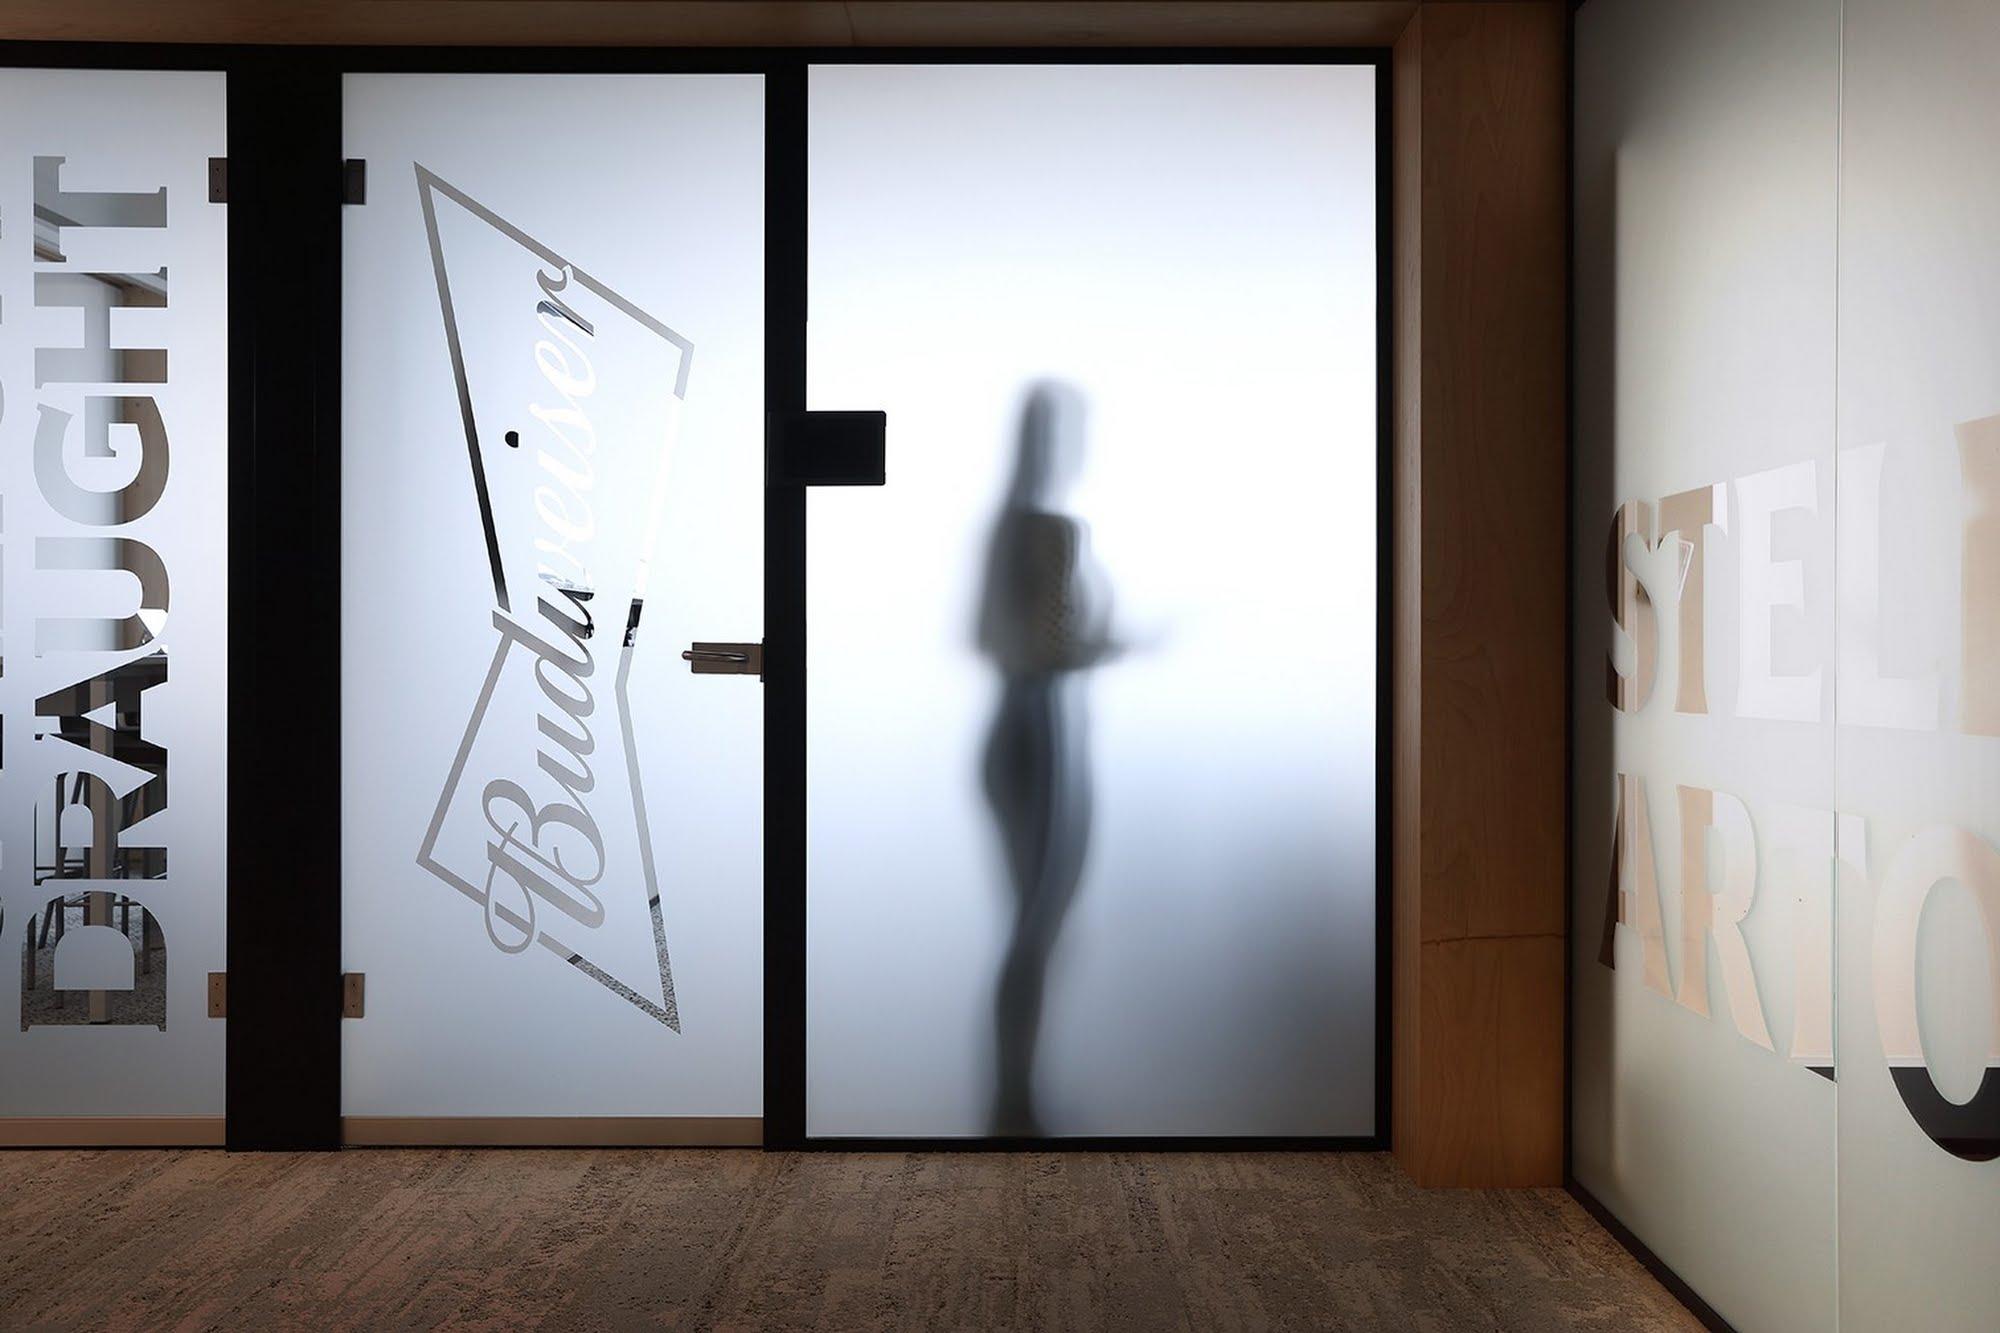 NovaOne - Ganzglaswände,Mieterausbau AB InBev,Deckensystem-Wandsysteme,Trennwände Büro,Ganzglaswände,Bürotrennwand,Akustikdecken,Schallschutzdecken,Trennwände,Glaswände,Faltwände,Raumgestaltung,Trennwand Systeme